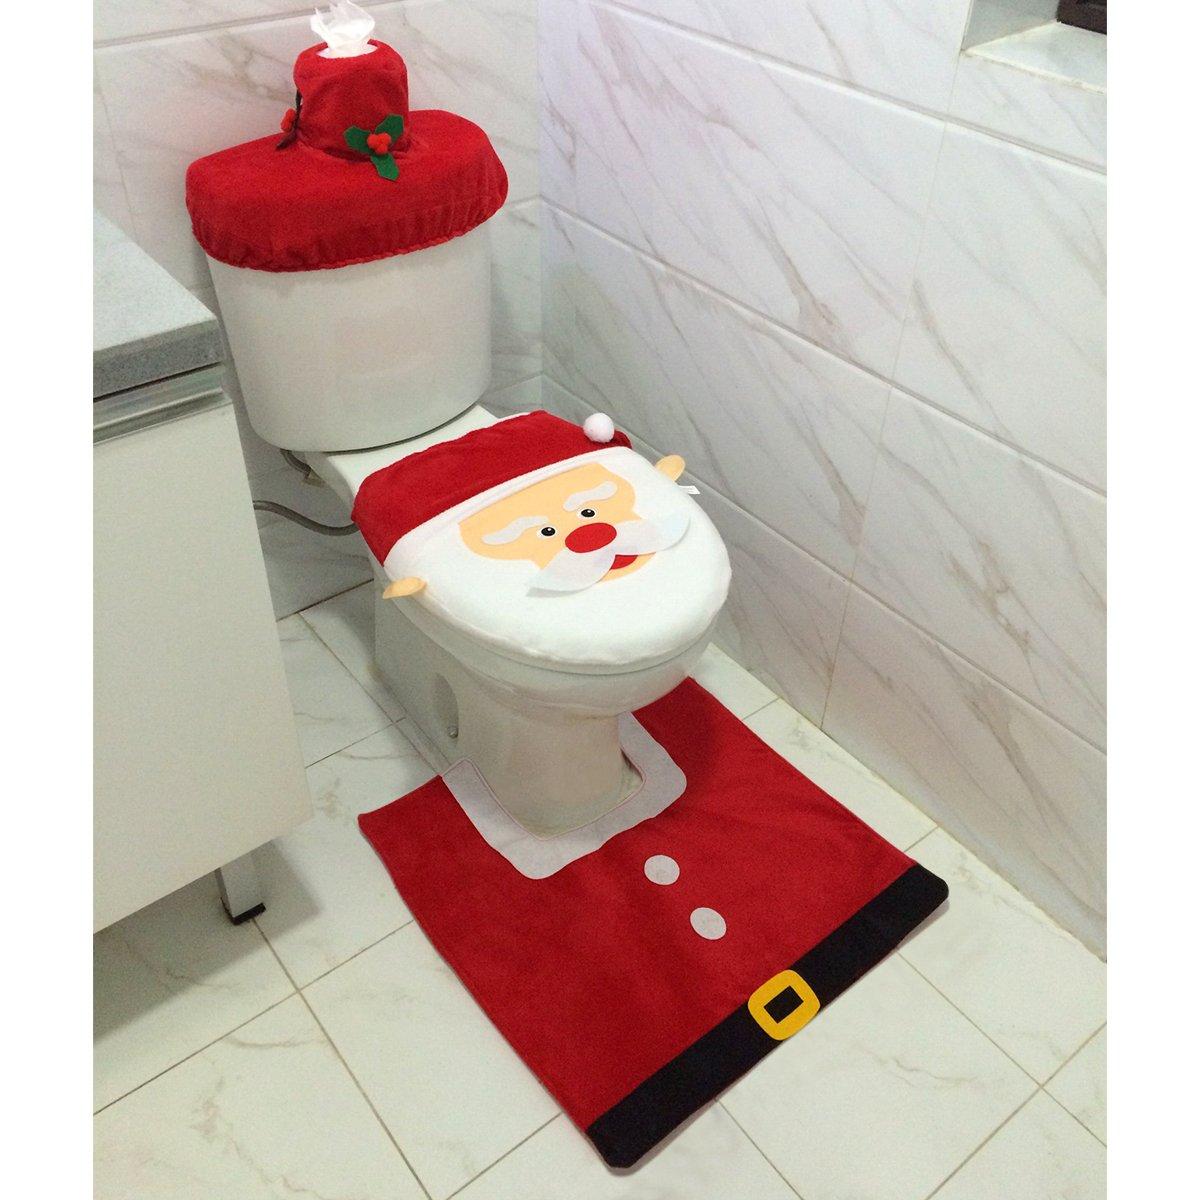 Santa Toilet Seat Cover and Rug Set Christmas Bathroom Sets for Christmas Decorations by NICEXMAS